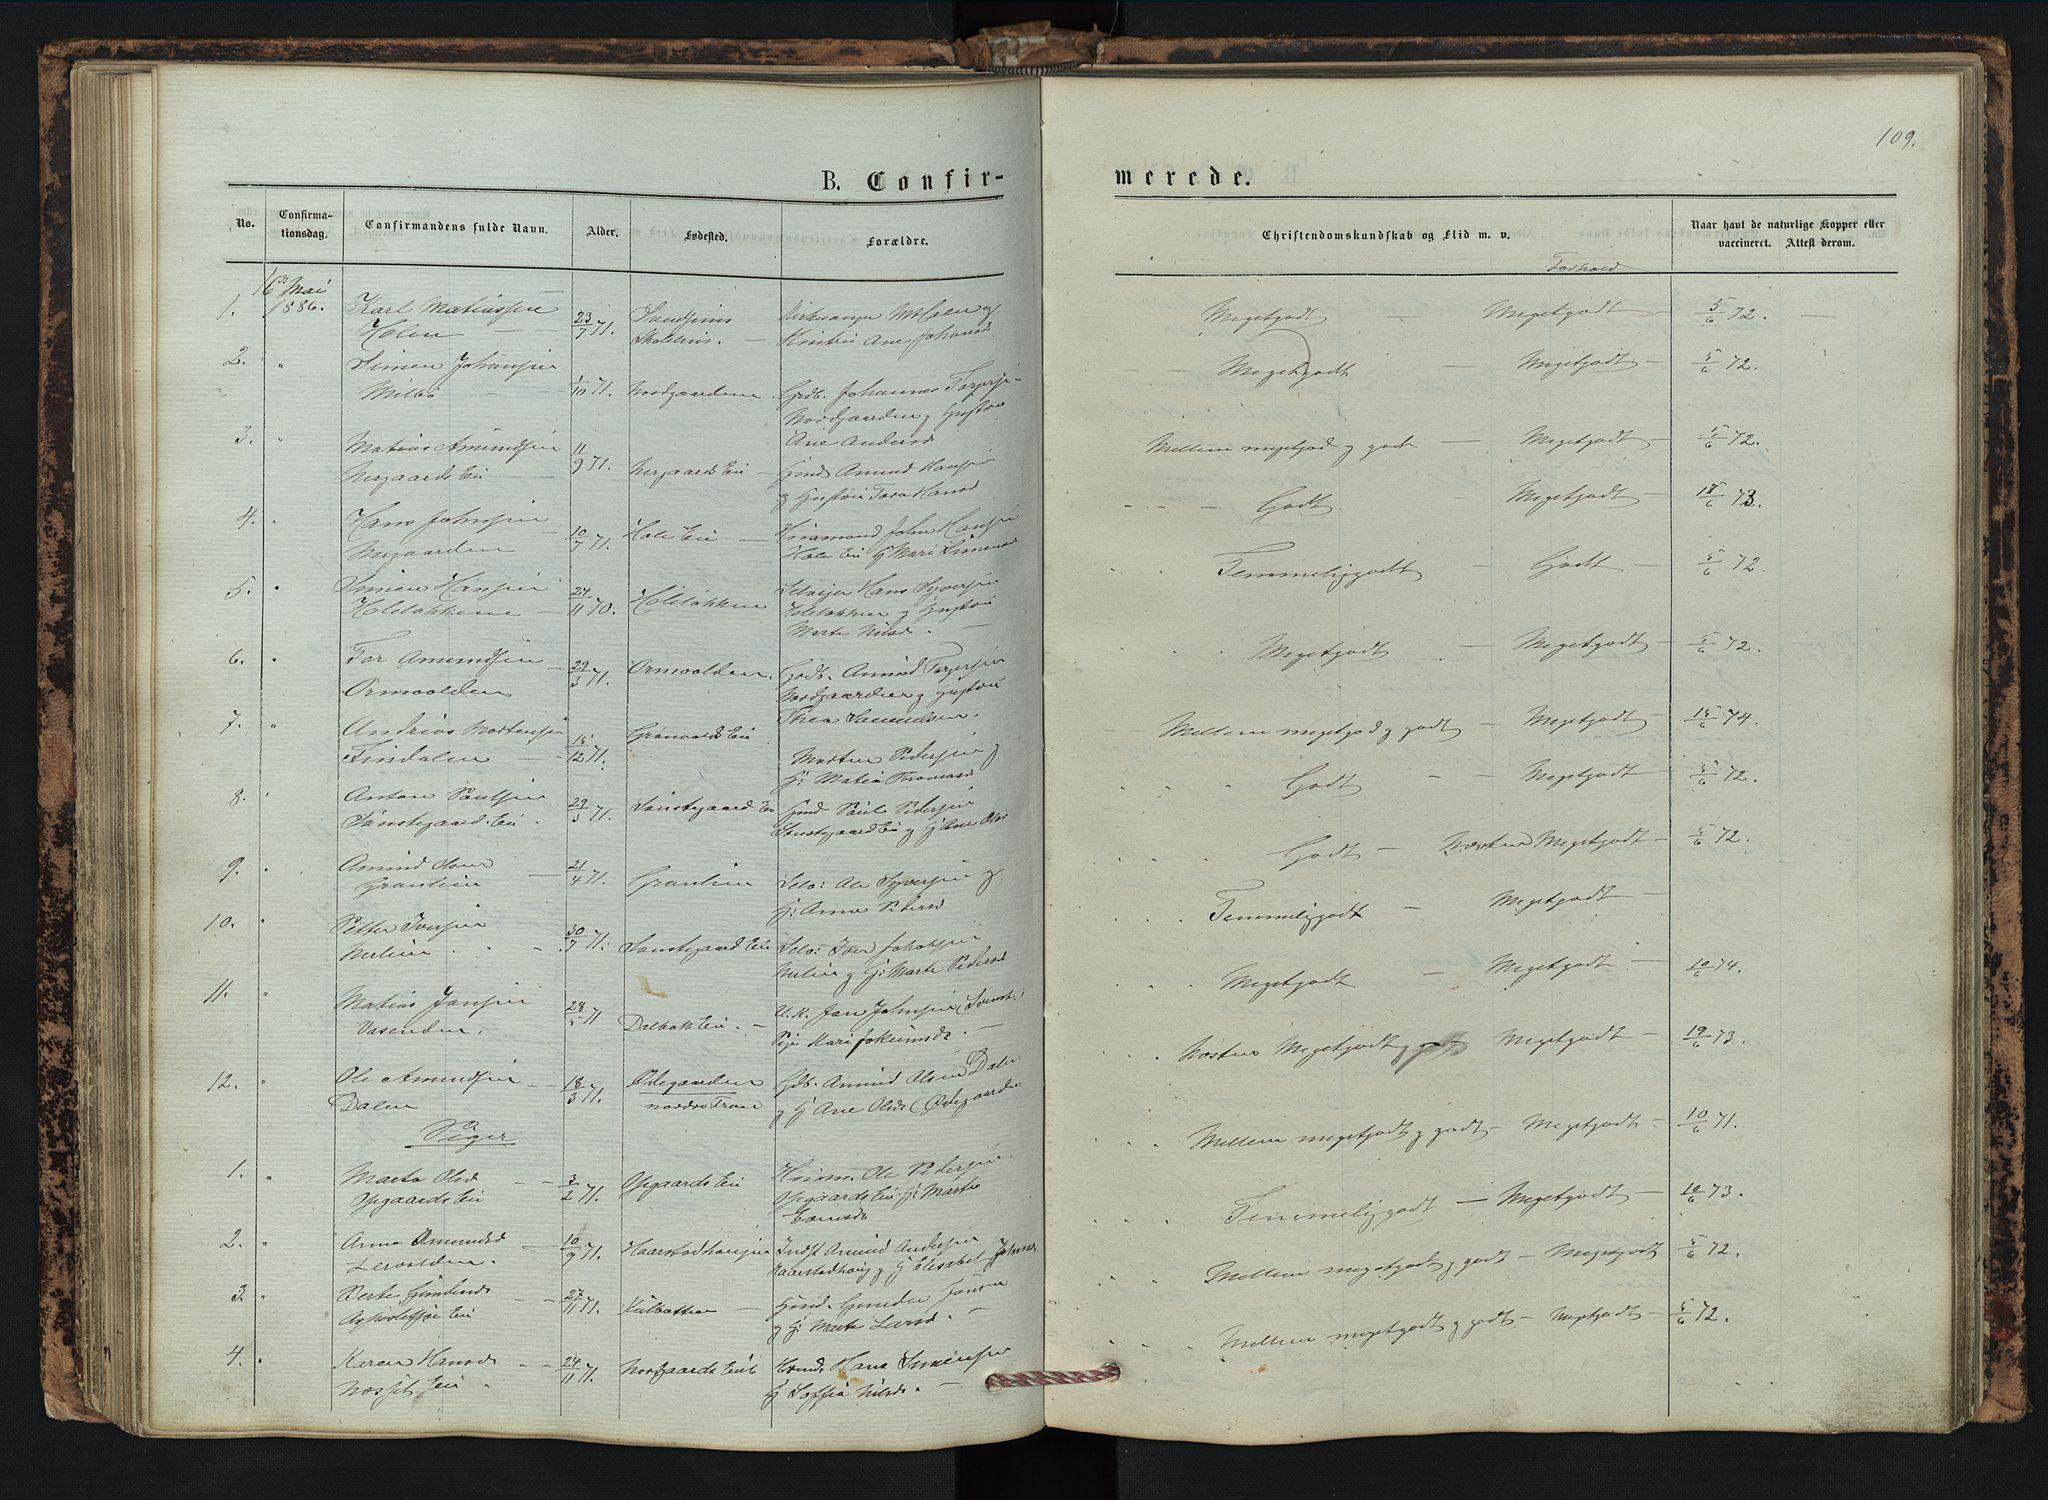 SAH, Vestre Gausdal prestekontor, Klokkerbok nr. 2, 1874-1897, s. 109